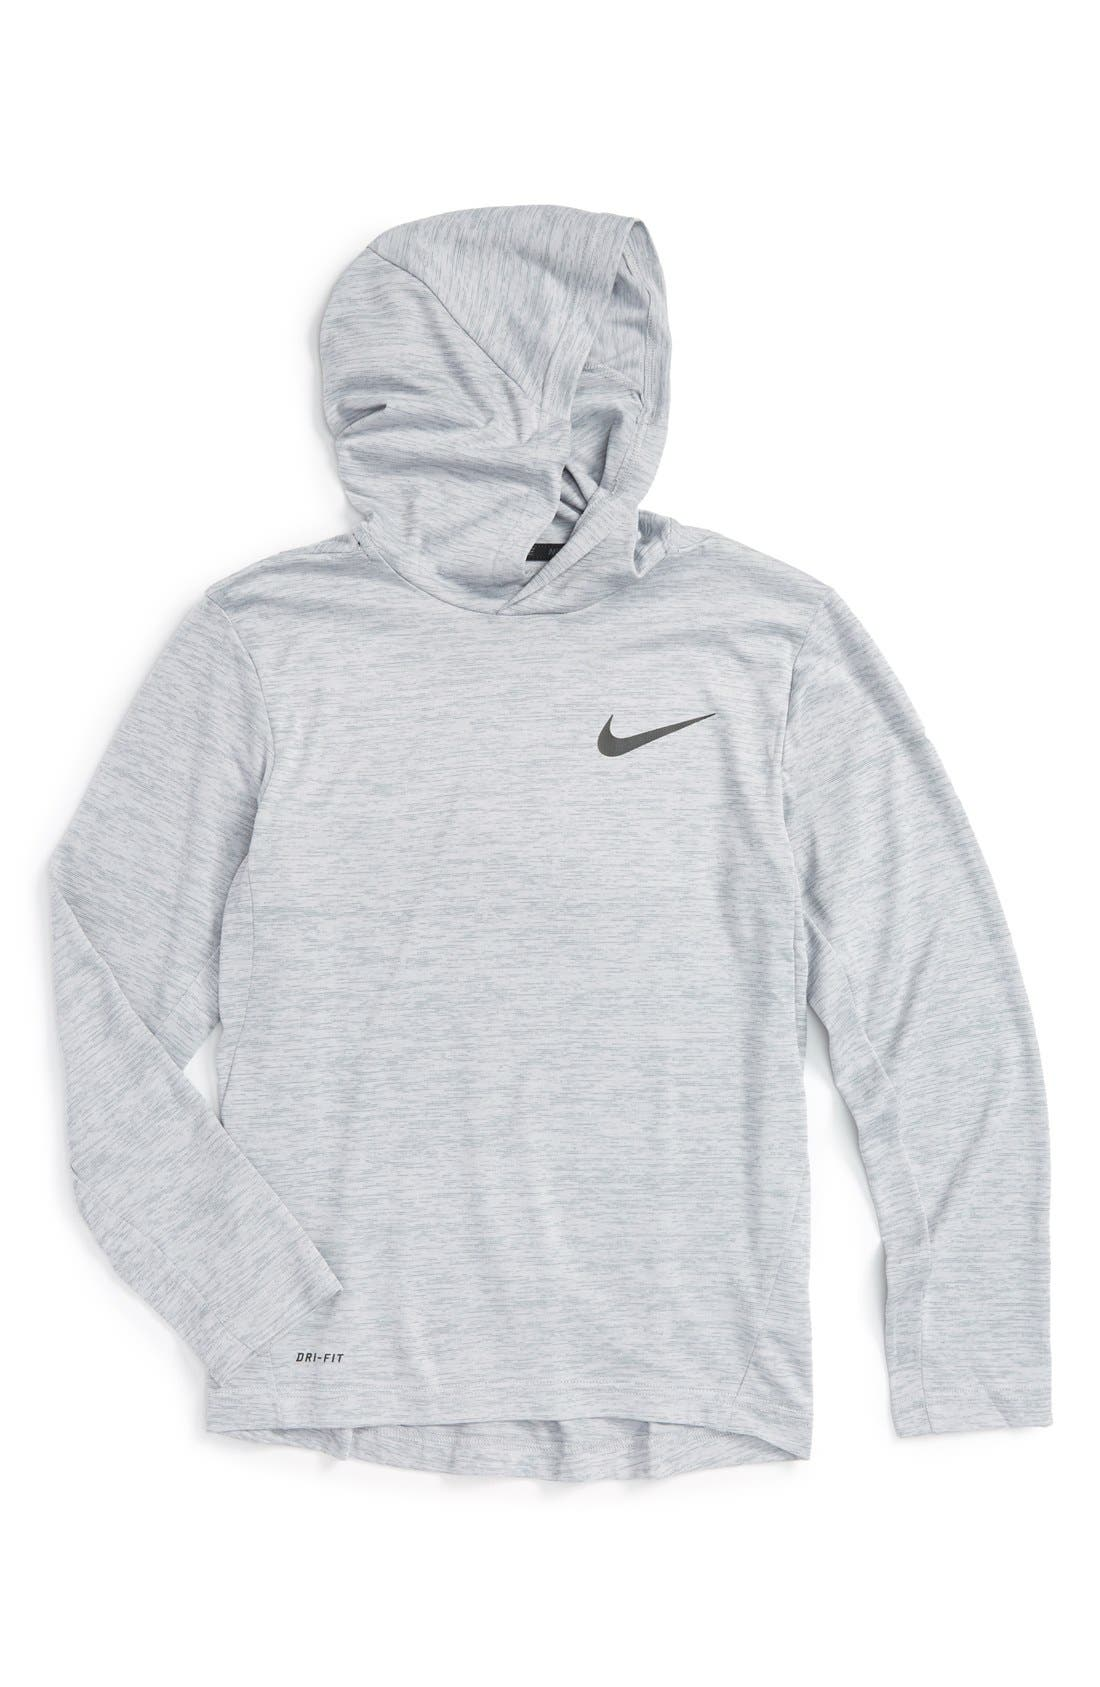 Main Image - Nike Hooded Long Sleeve Dri-FIT Training Top (Little Boys & Big Boys)